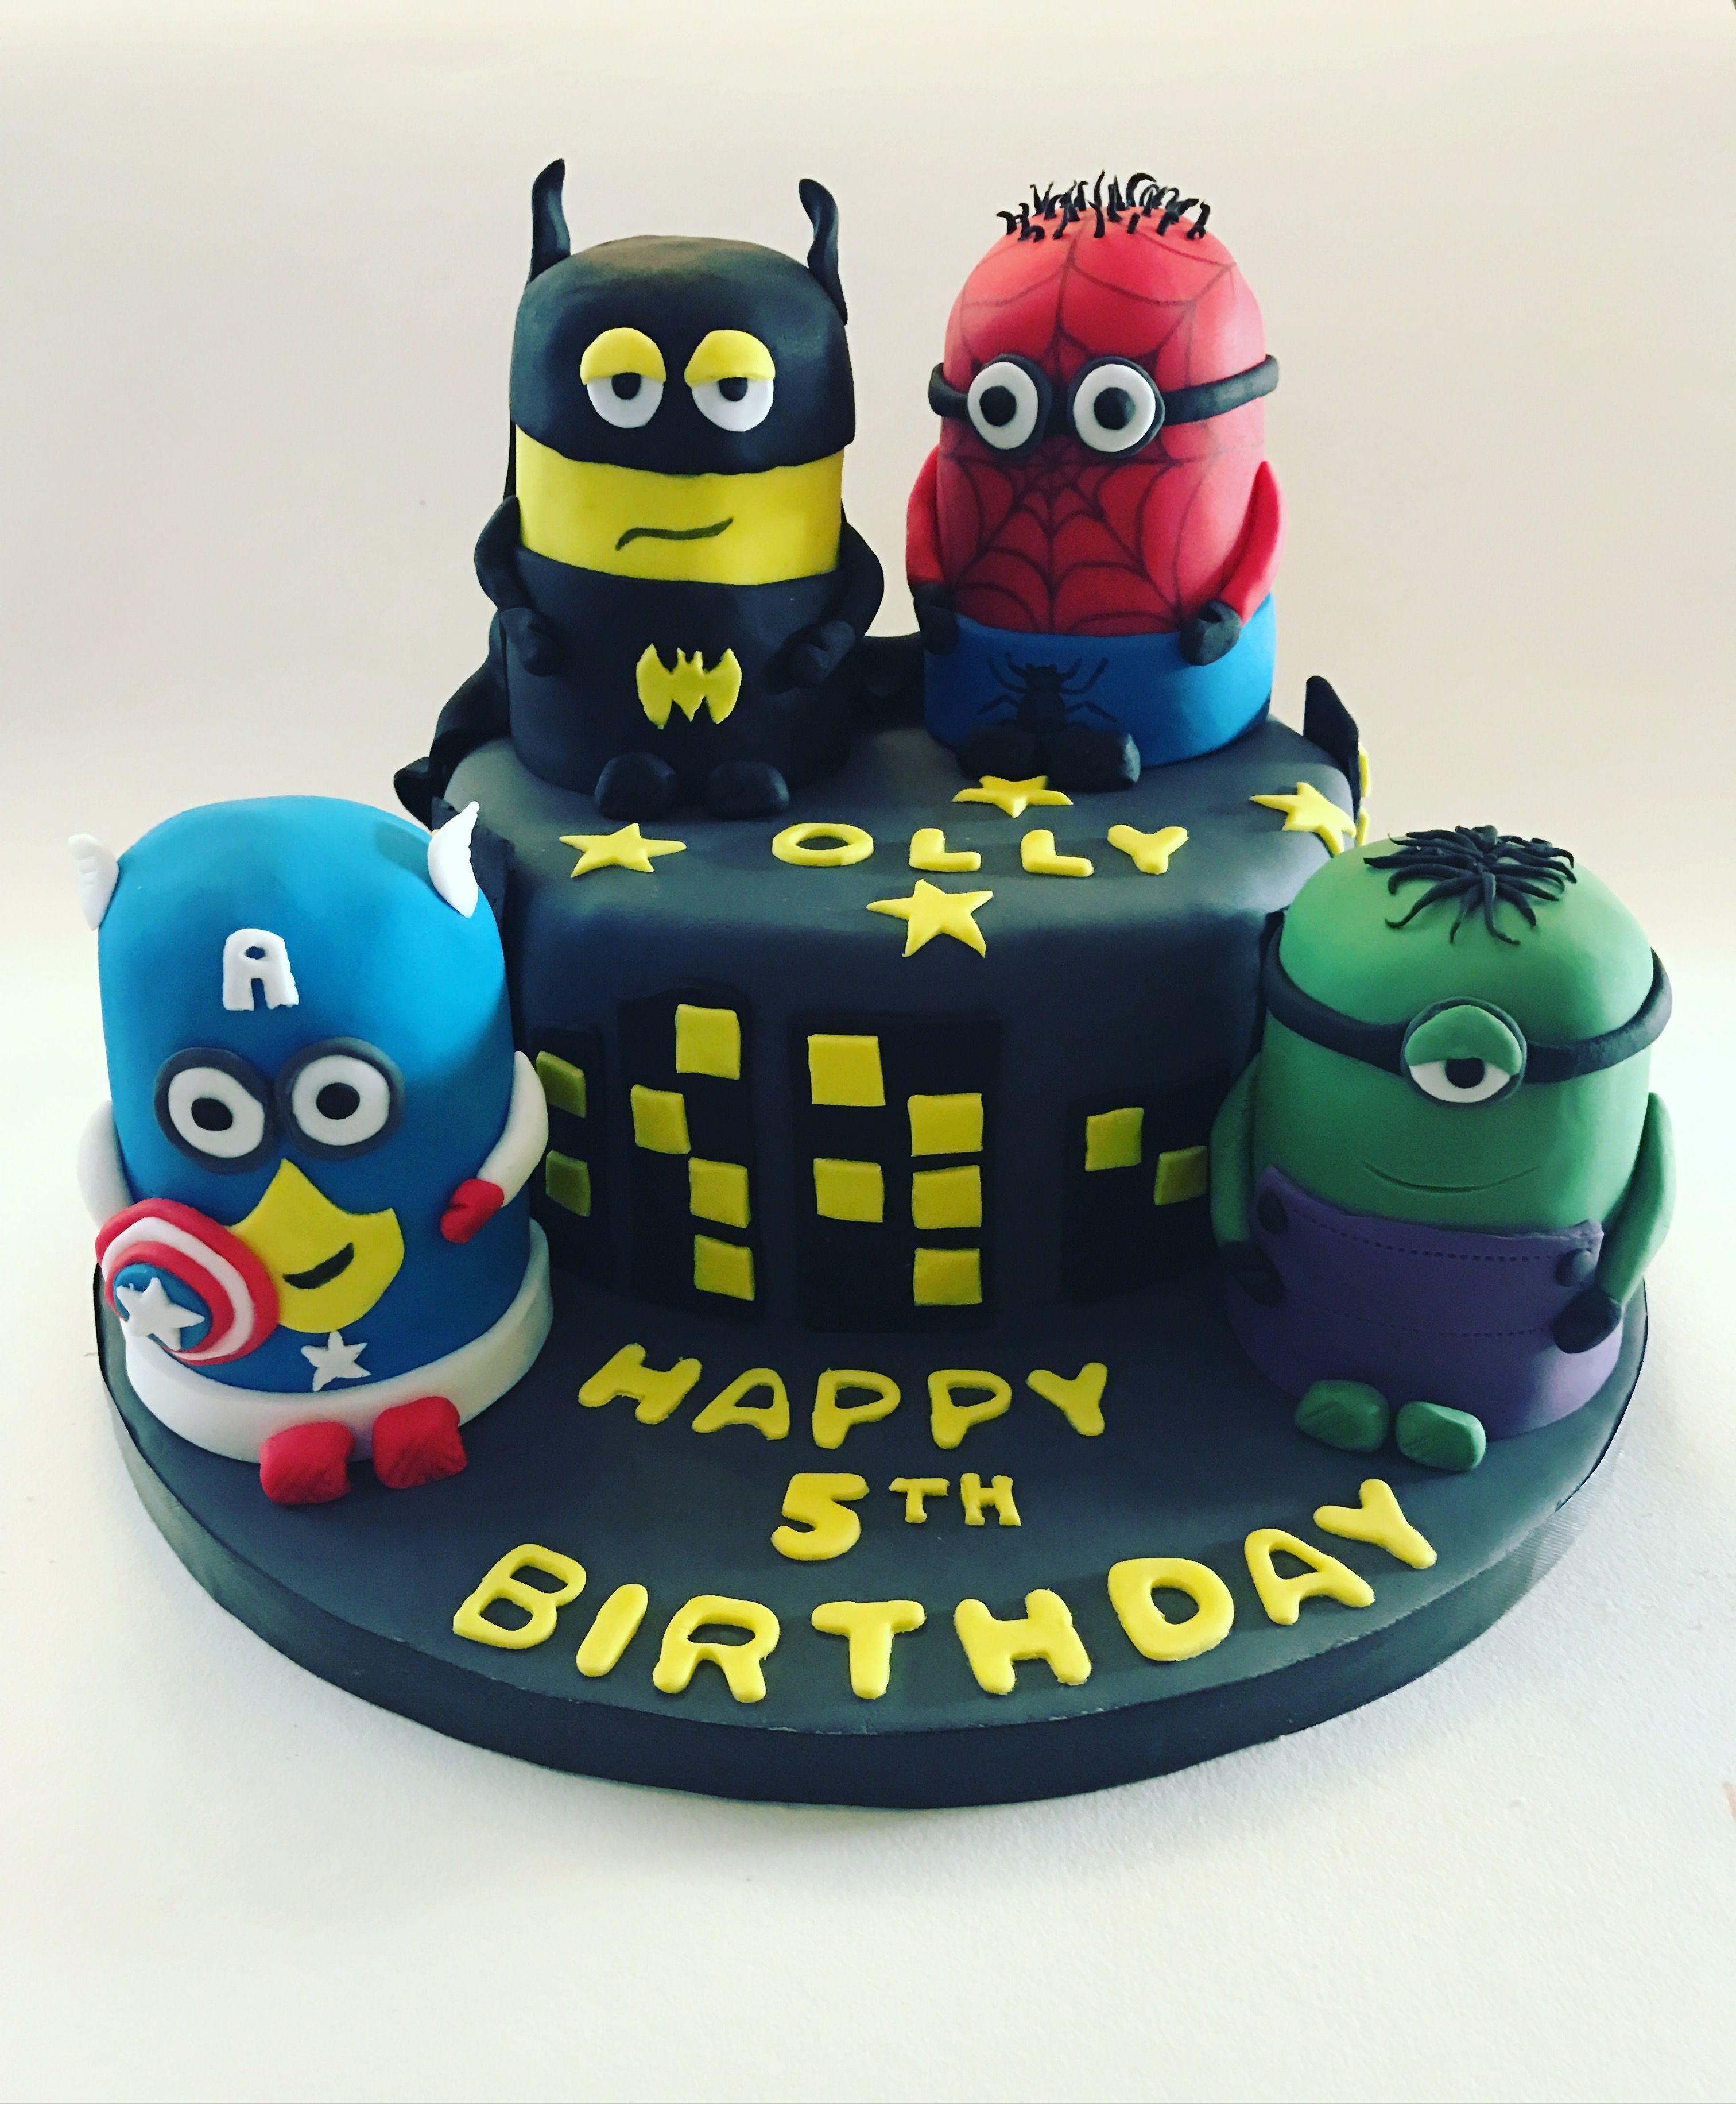 Minion and super hero cake